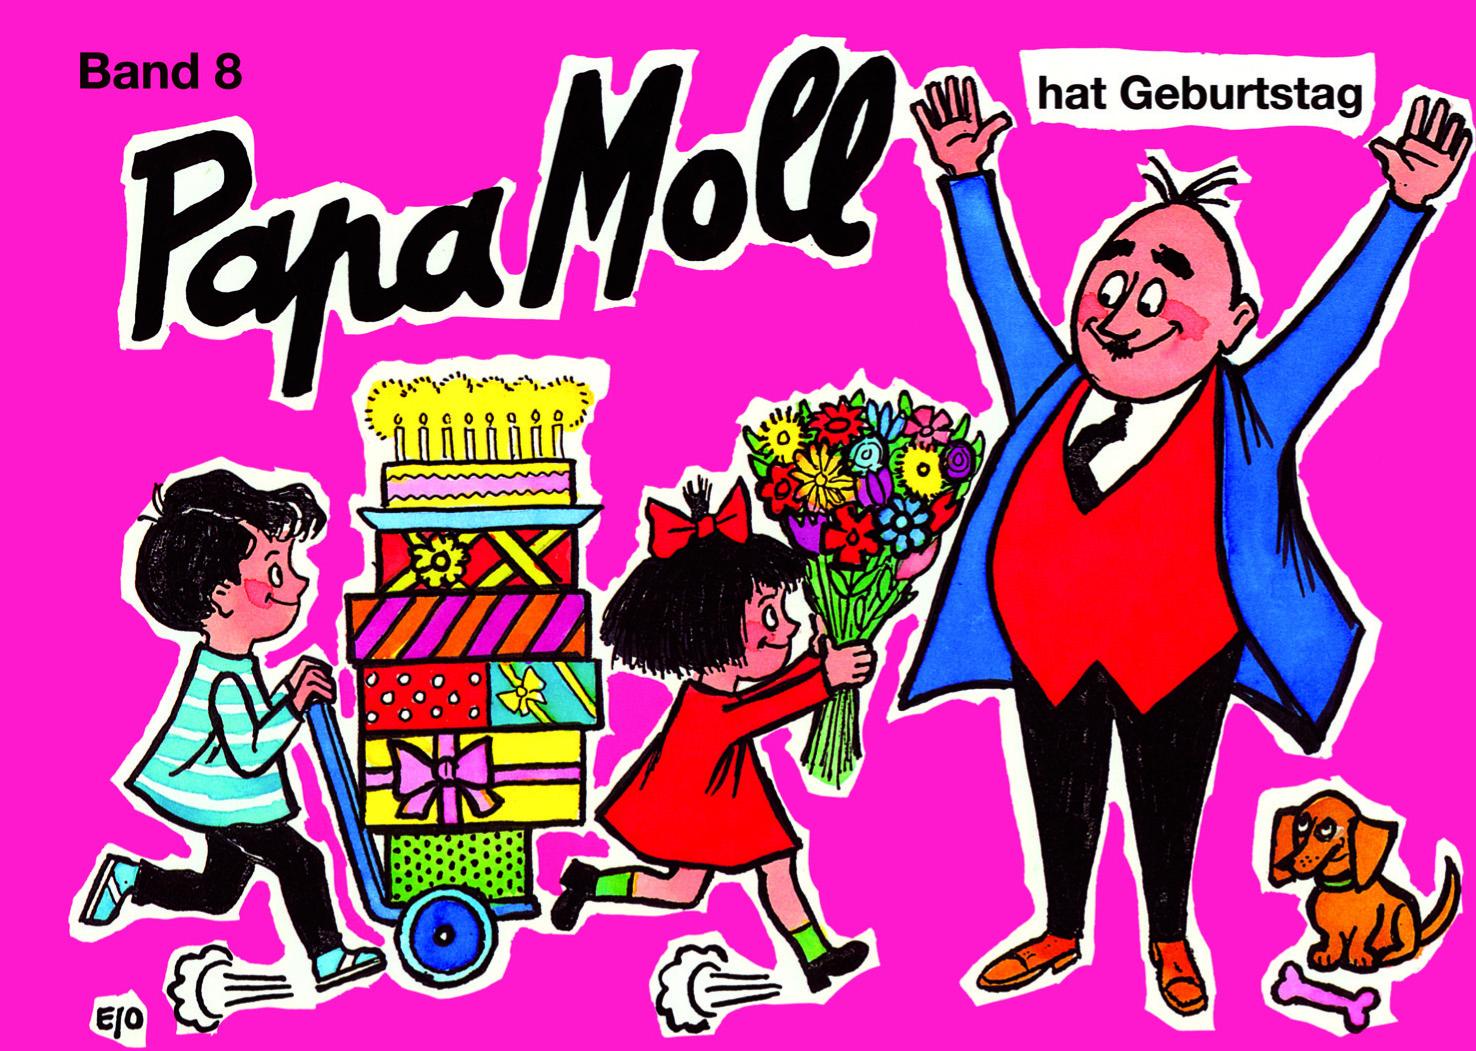 Papa Moll Hat Geburtstag Globi Verlag Orell Fussli